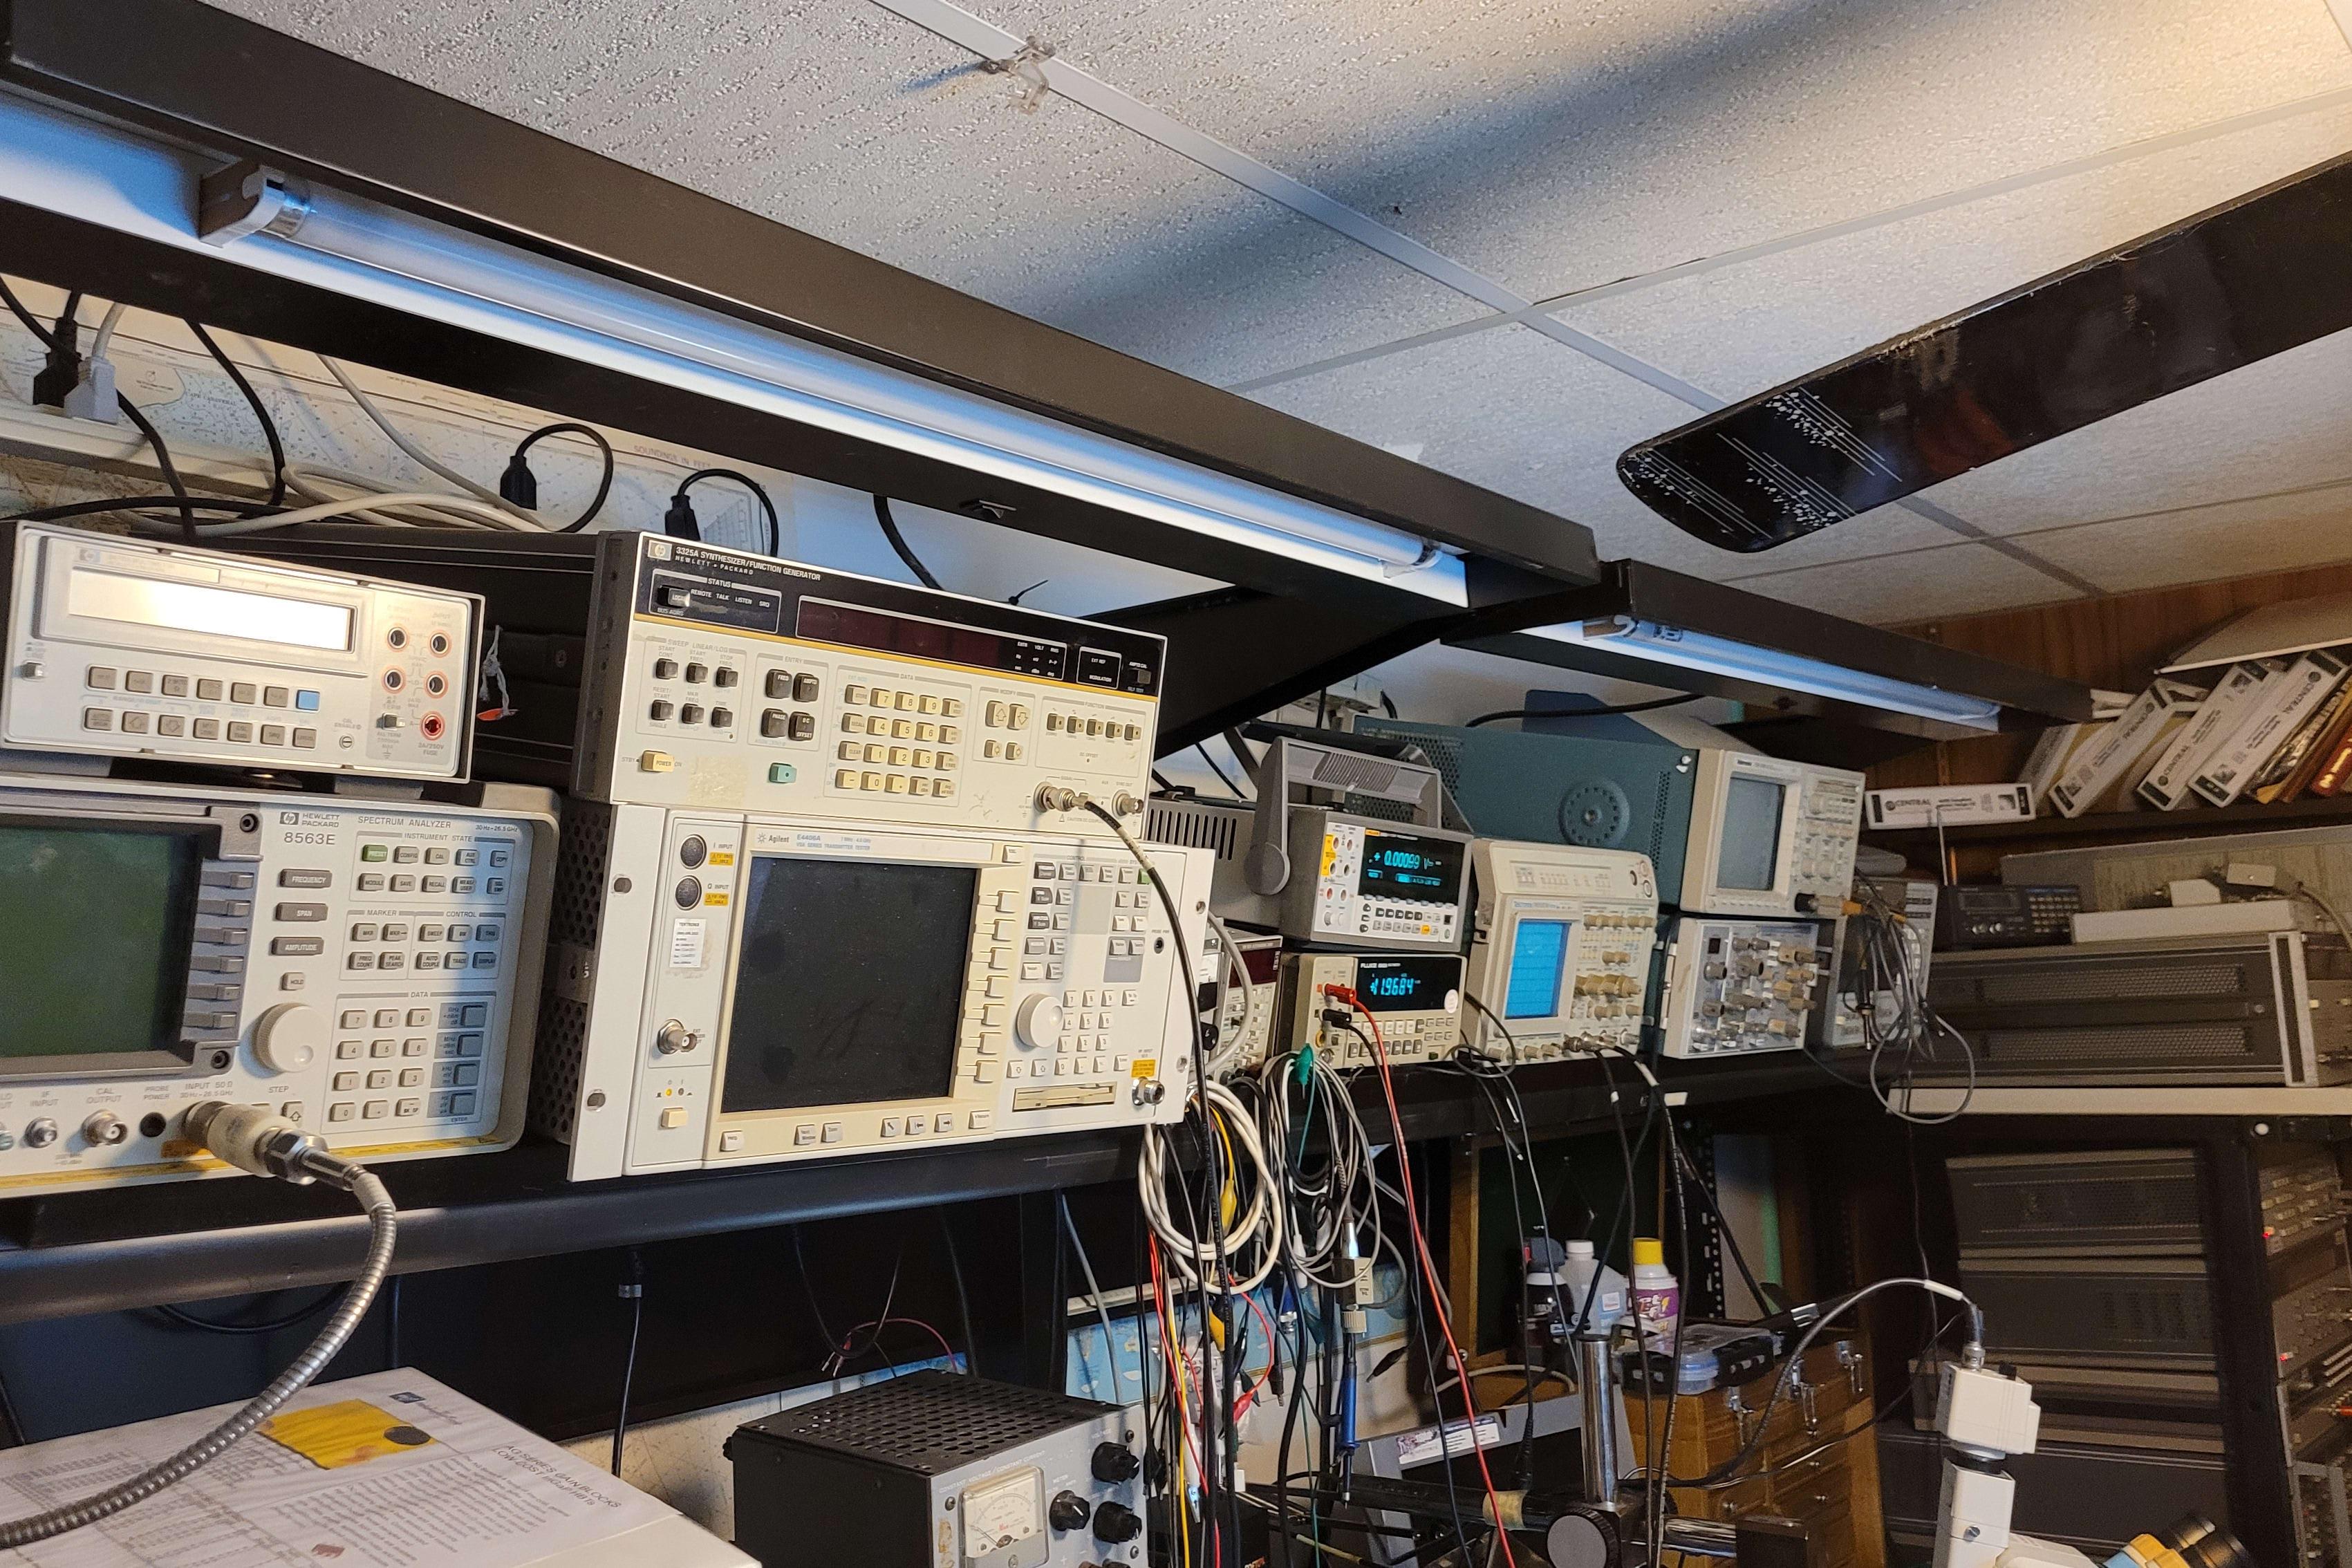 Portfolio for Analog, Digital, and Optical Engineering